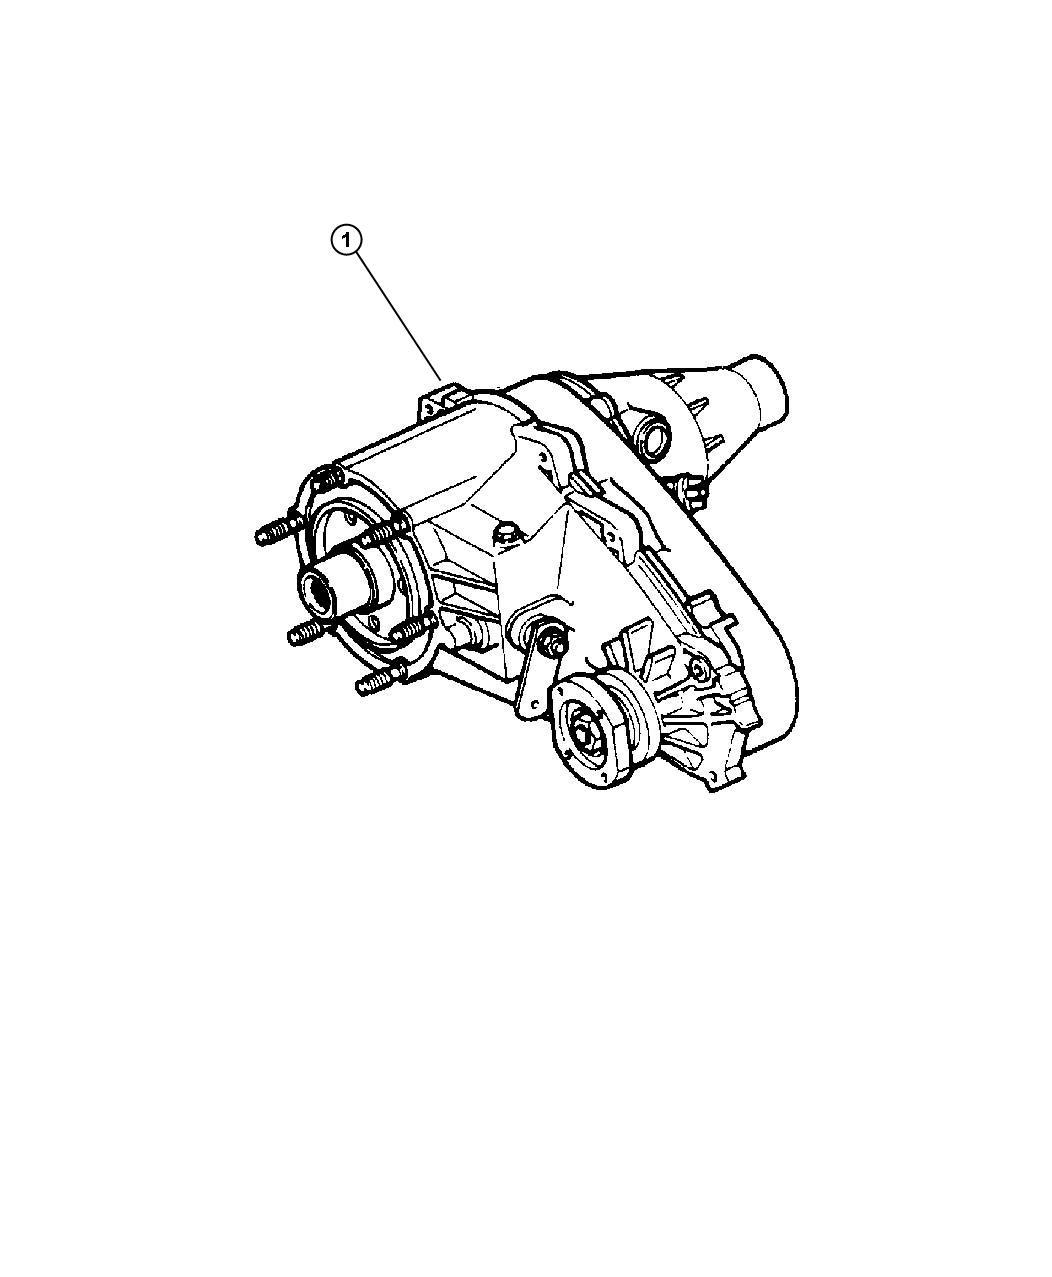 Dodge Dakota Transfer Case Nv233 Remanufactured